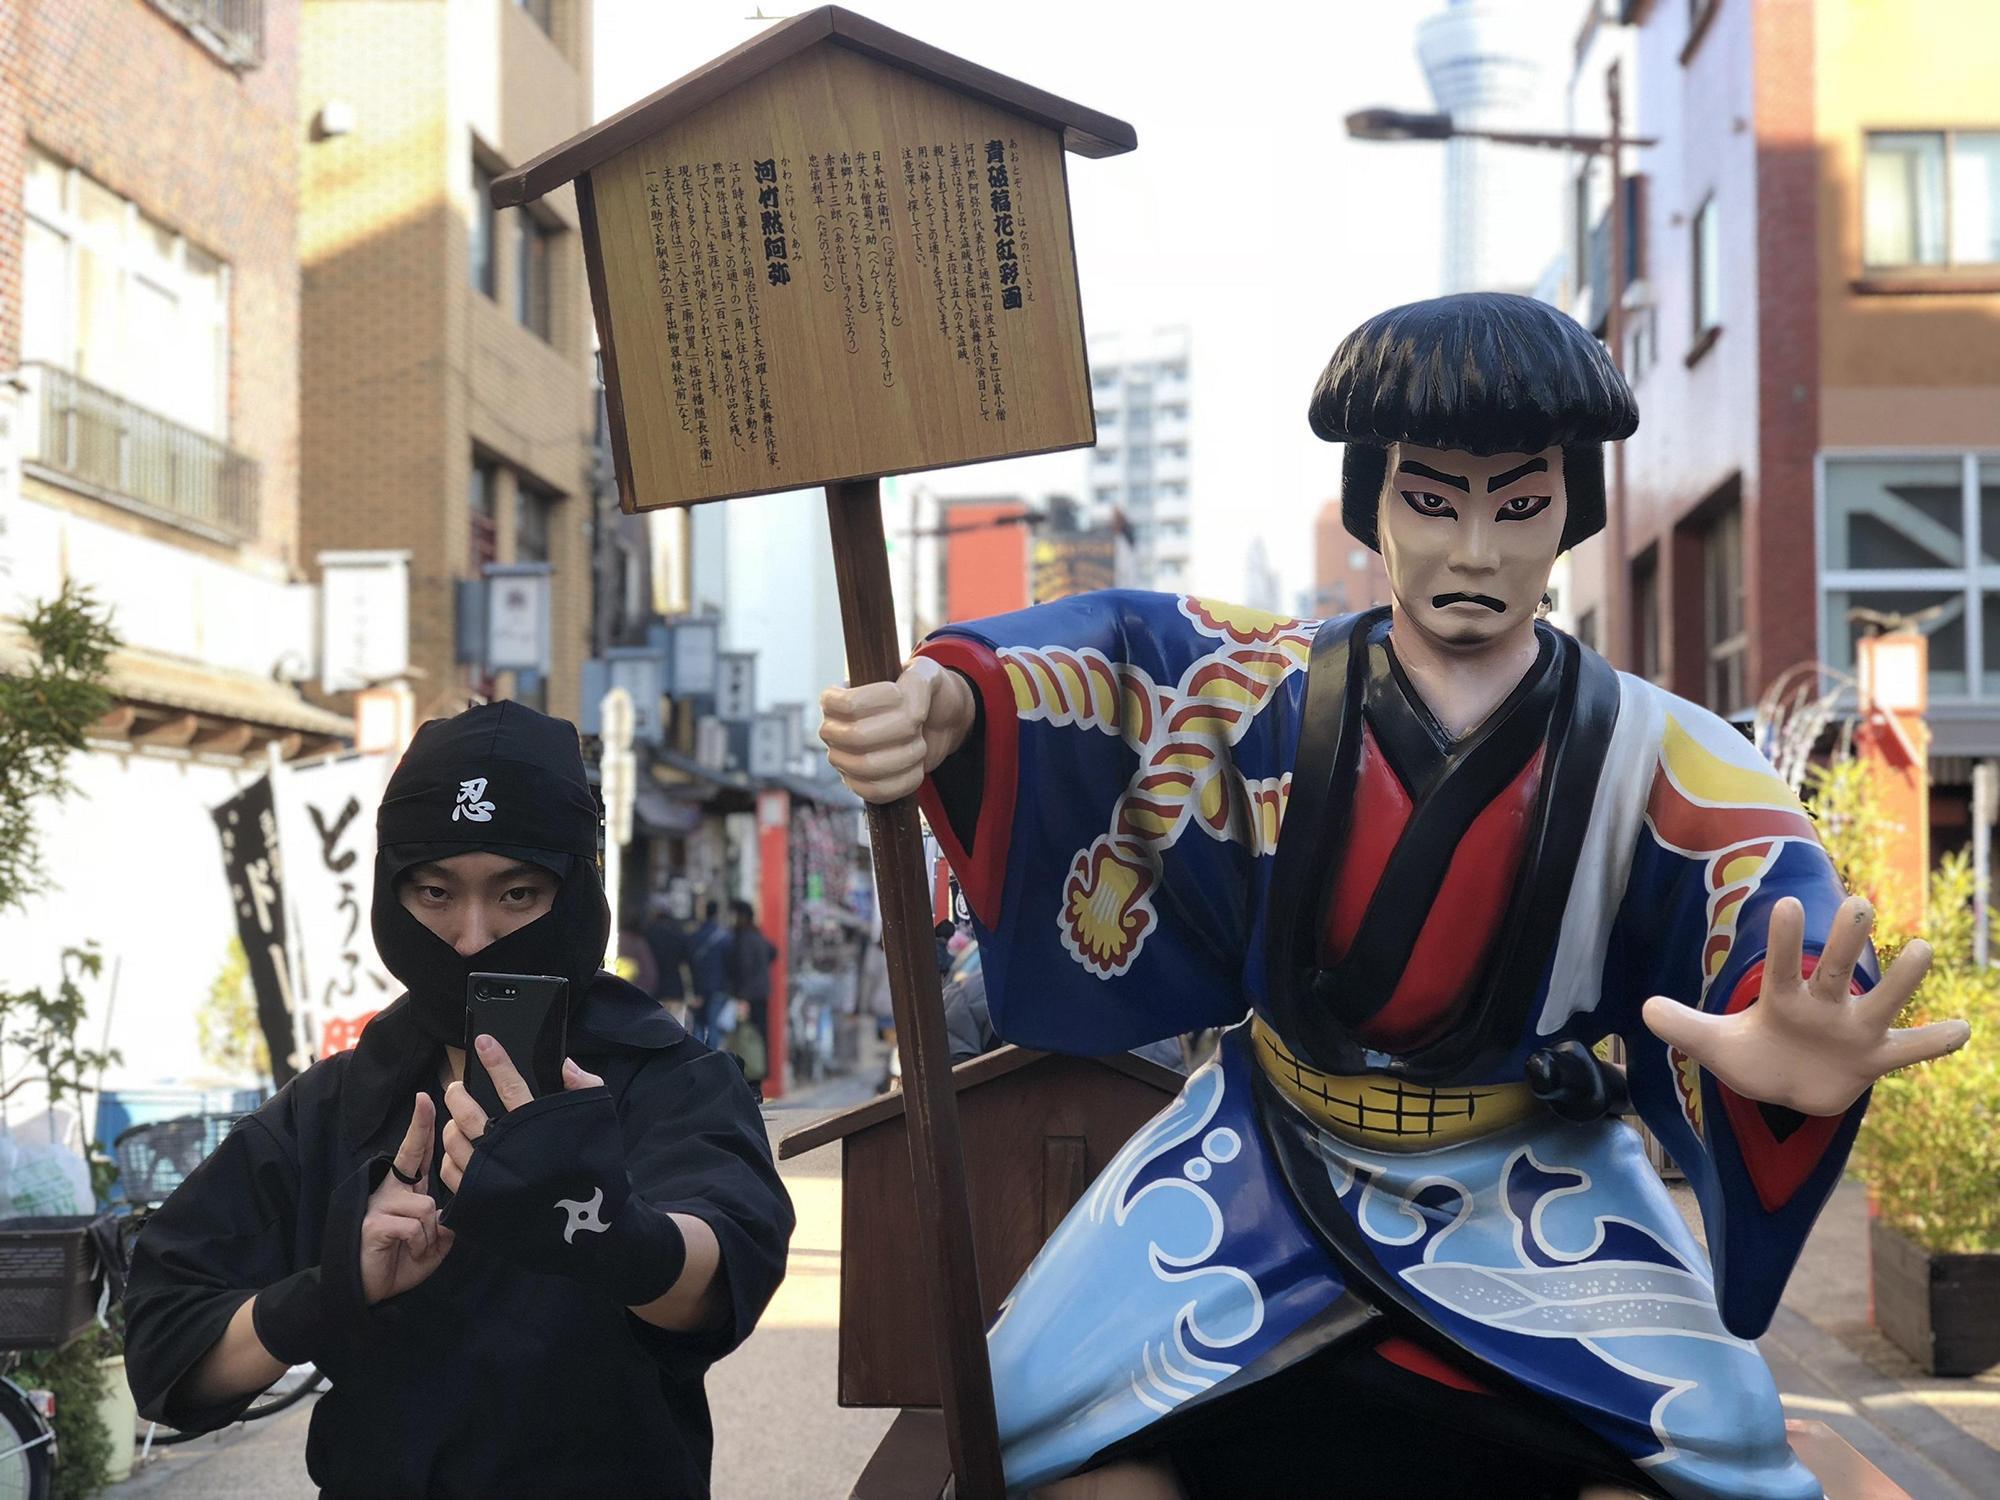 photo: ninja and object